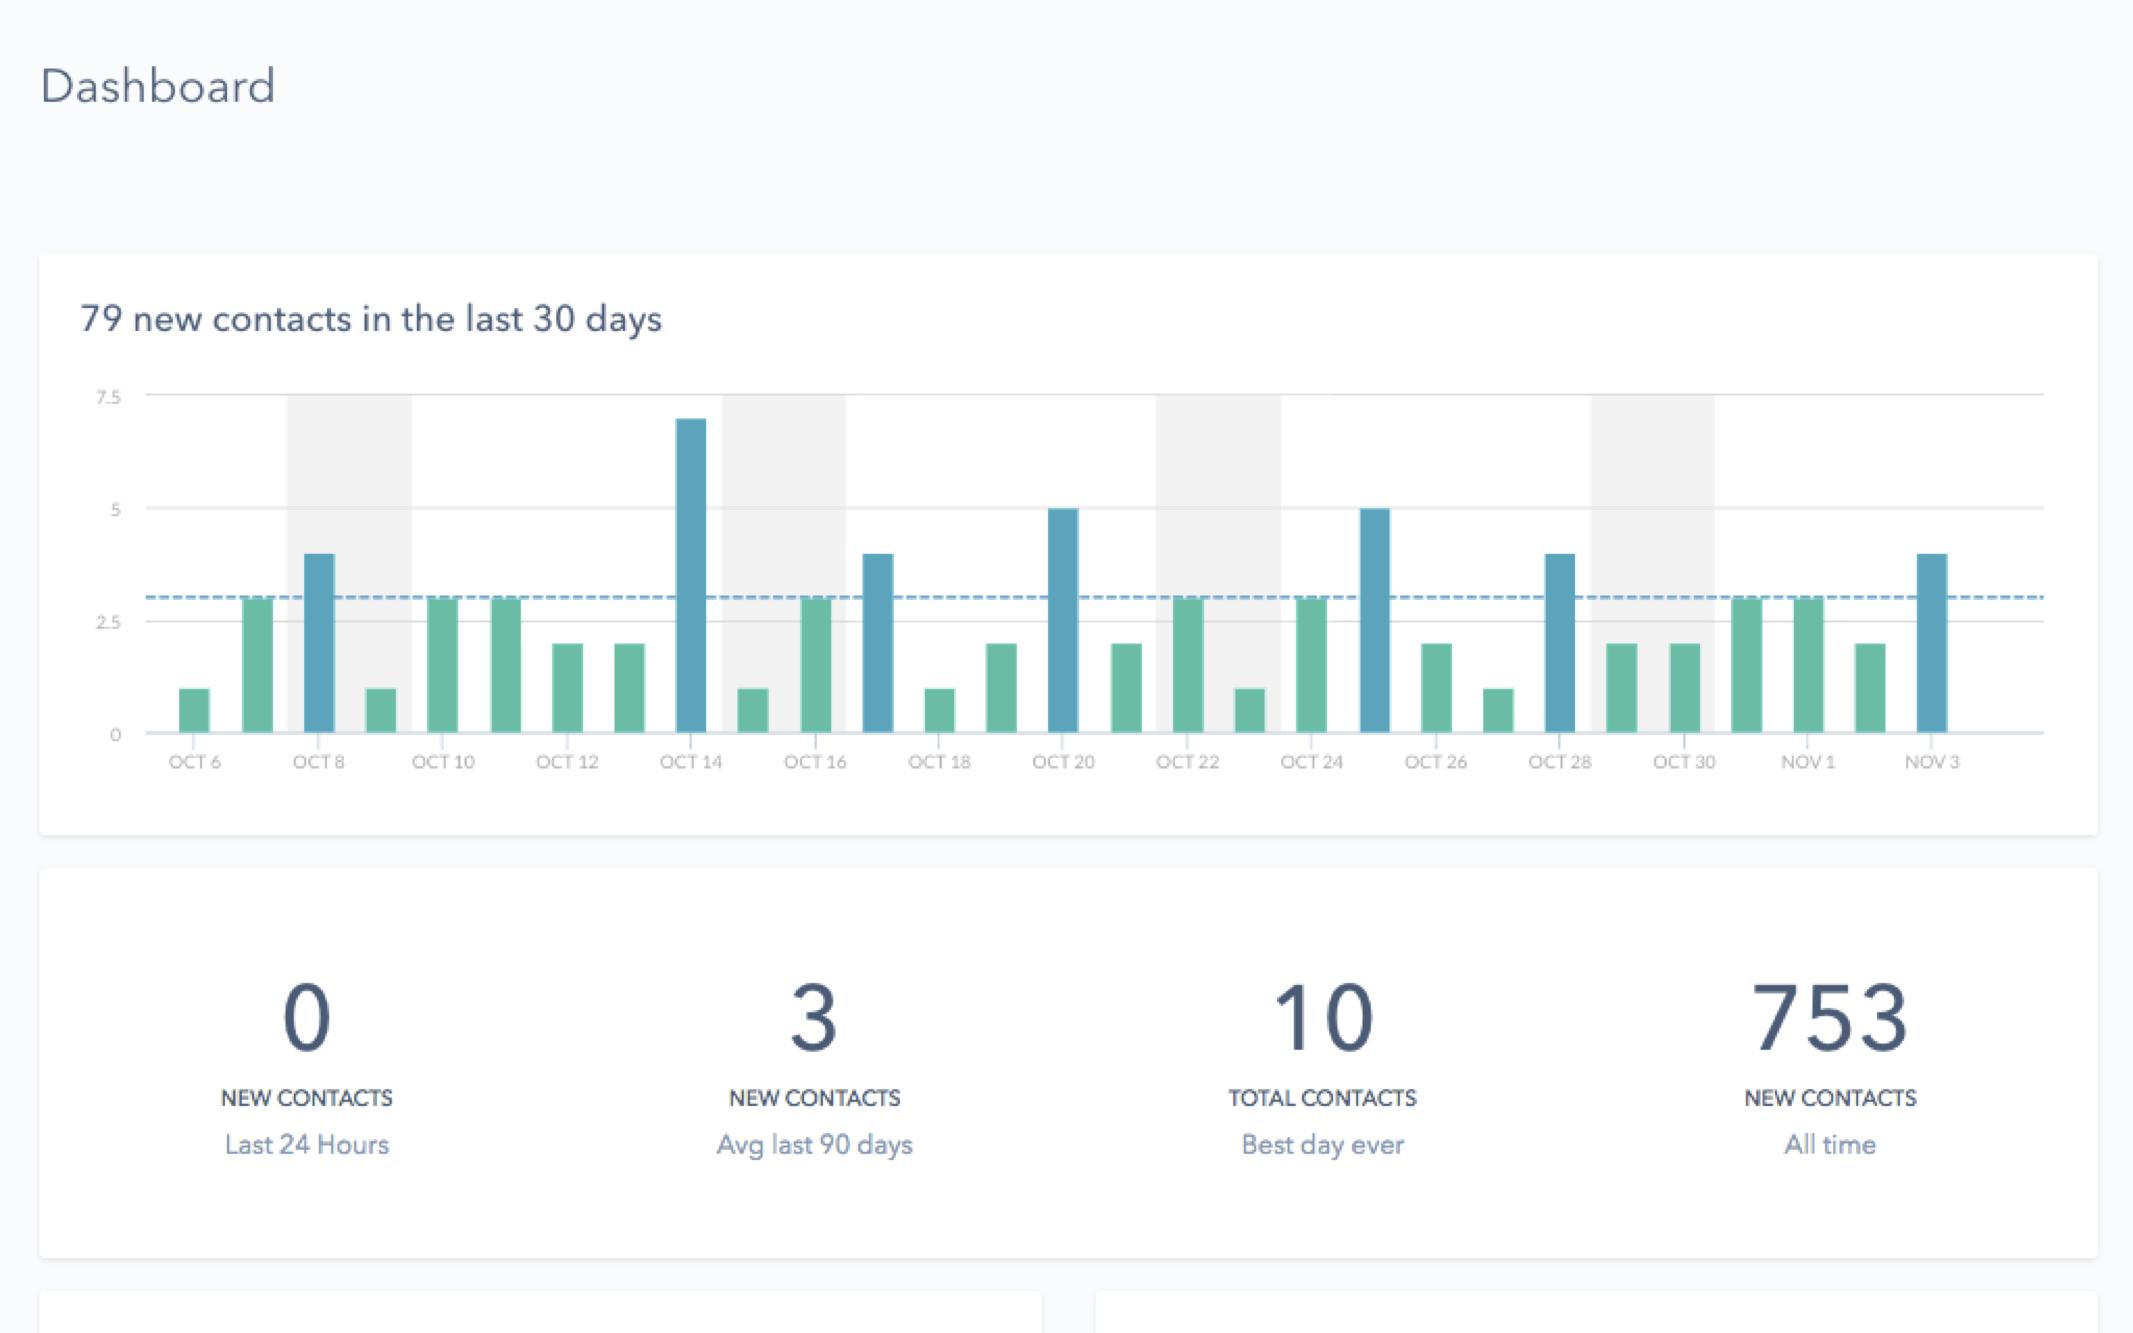 hubspot-marketing-free-dashboard